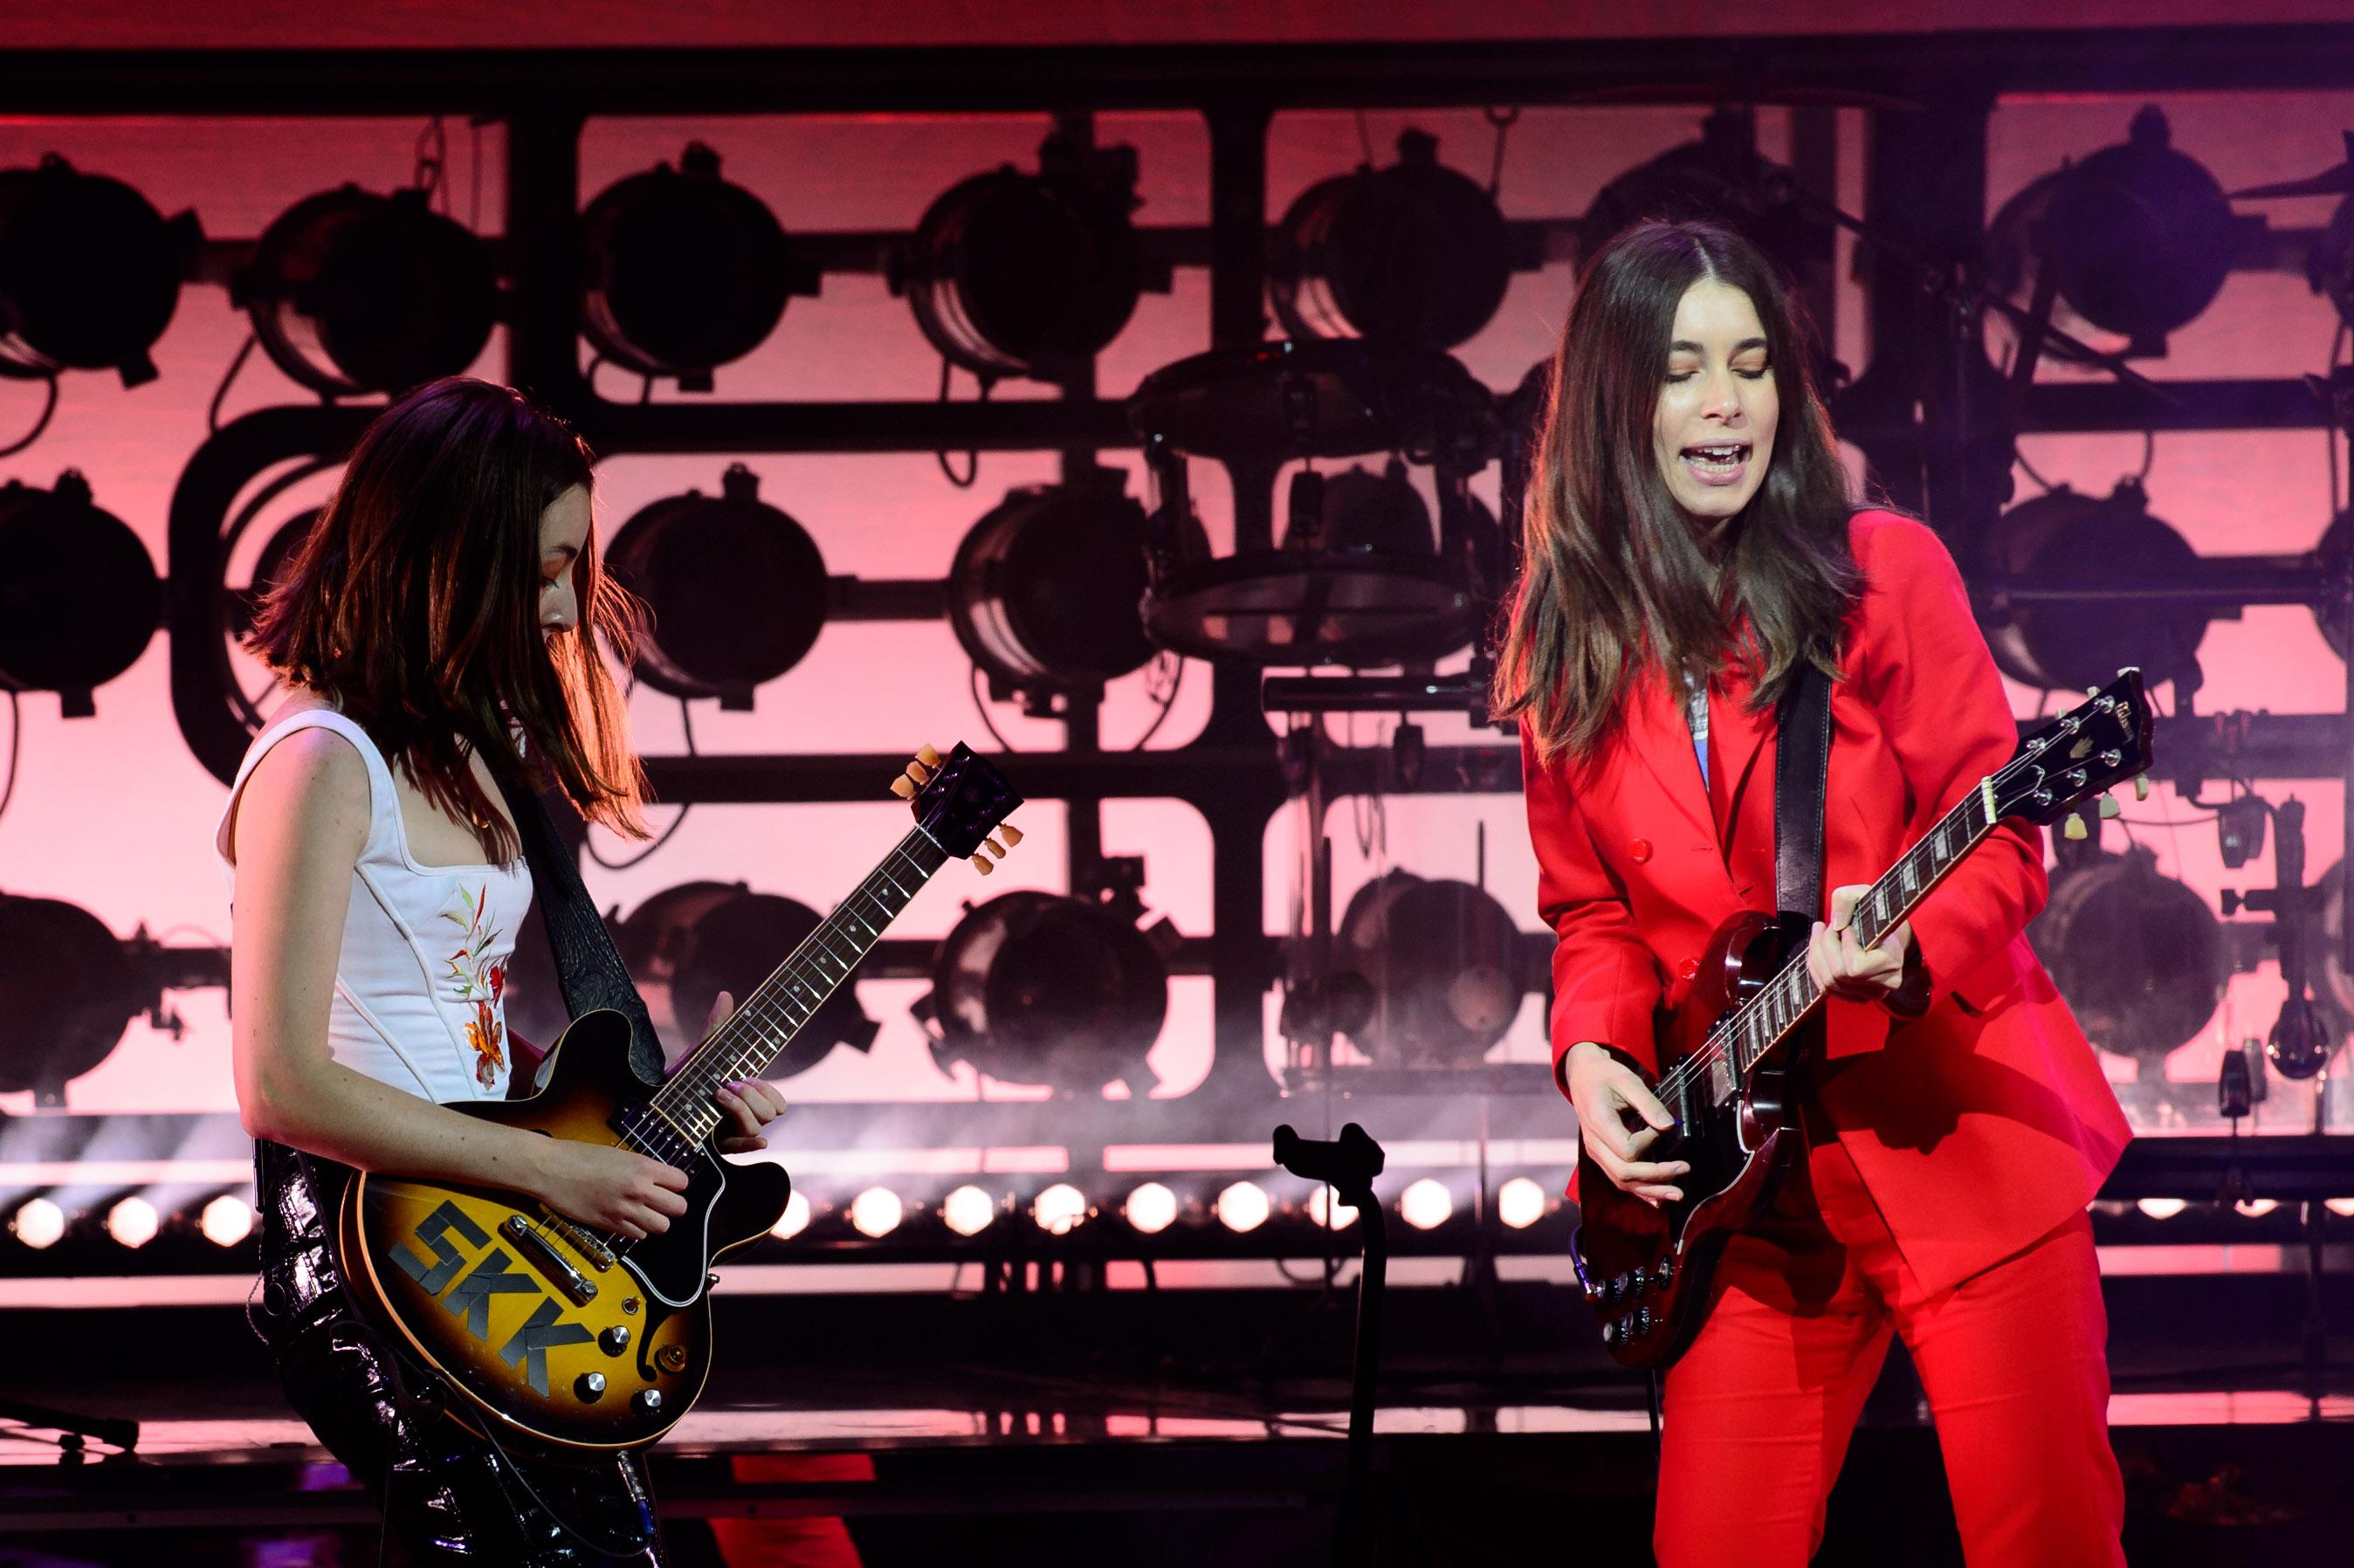 Both sisters play guitar.